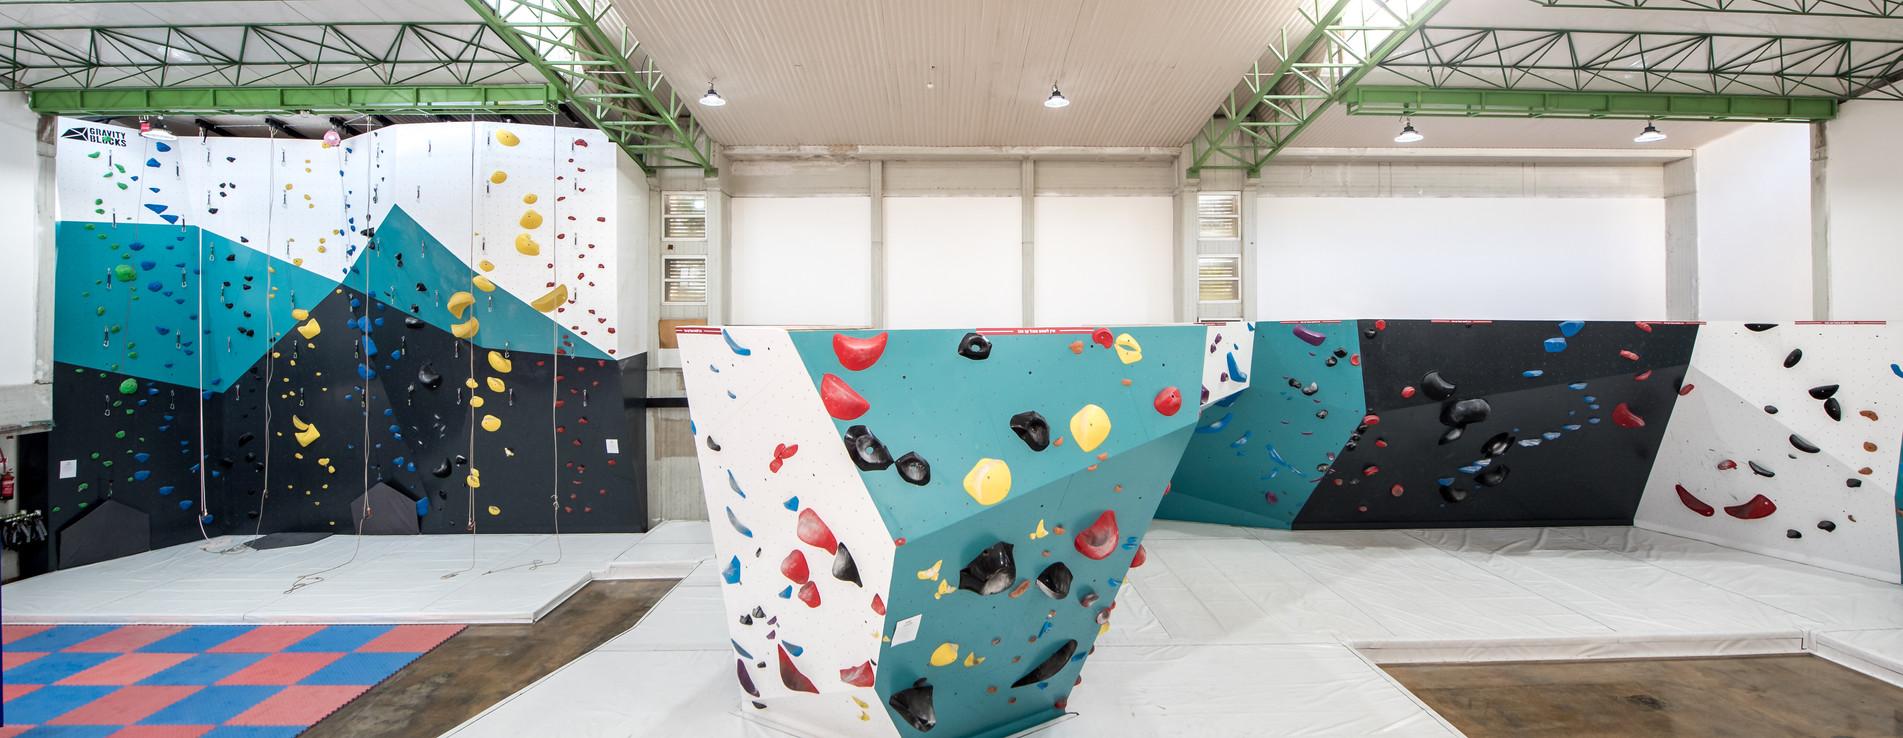 rujum climbing gym - קיר טיפוס רוג'ום